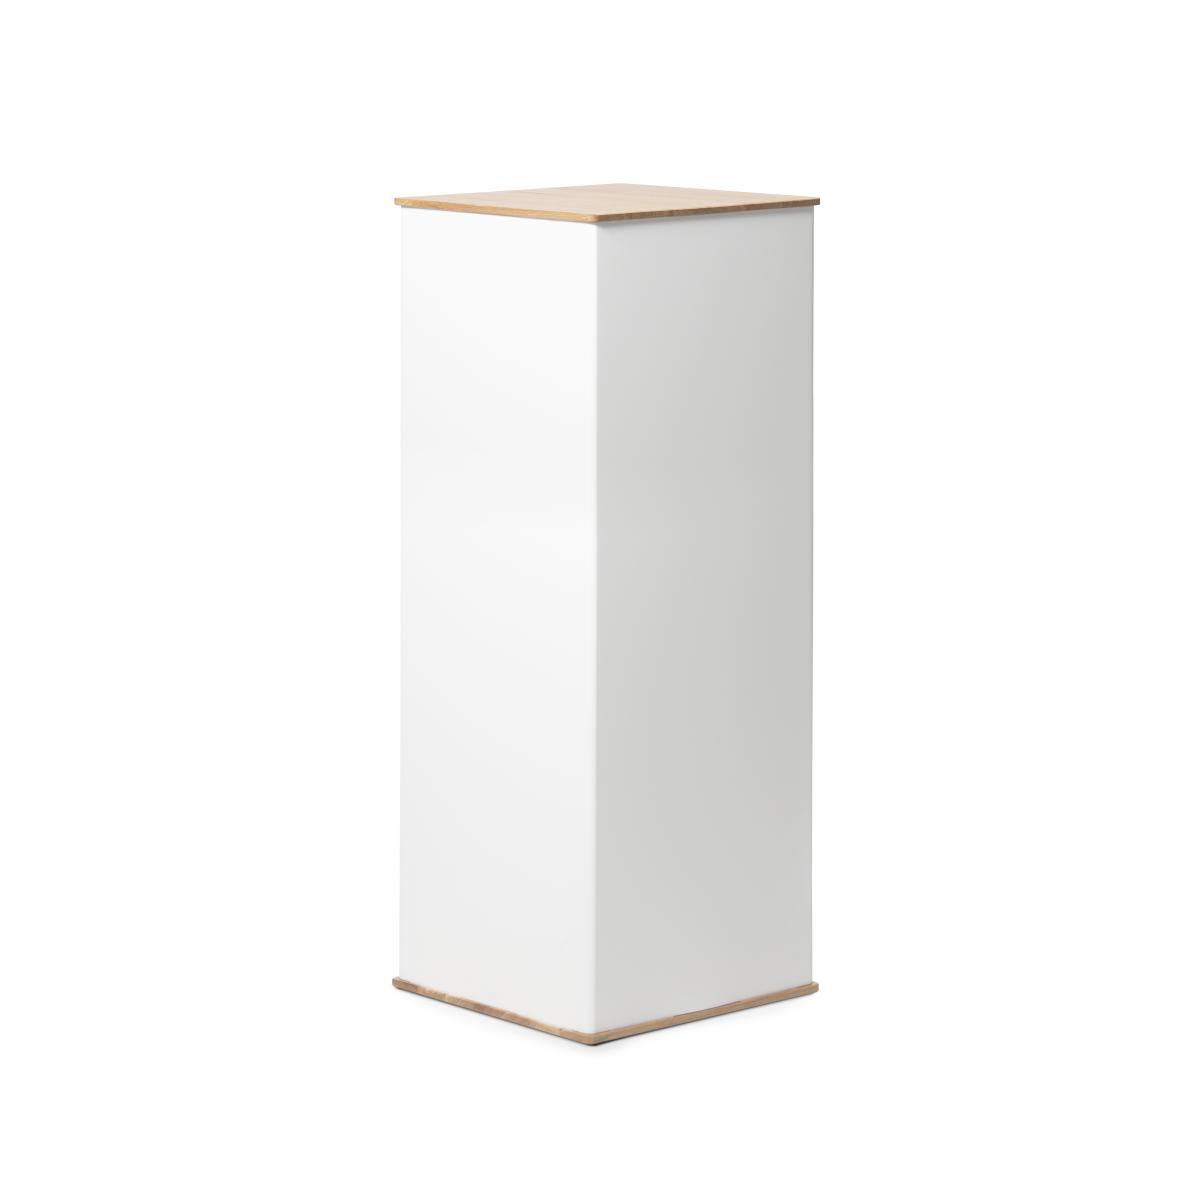 flux BLOX Säule 40 x 100 cm, weiß